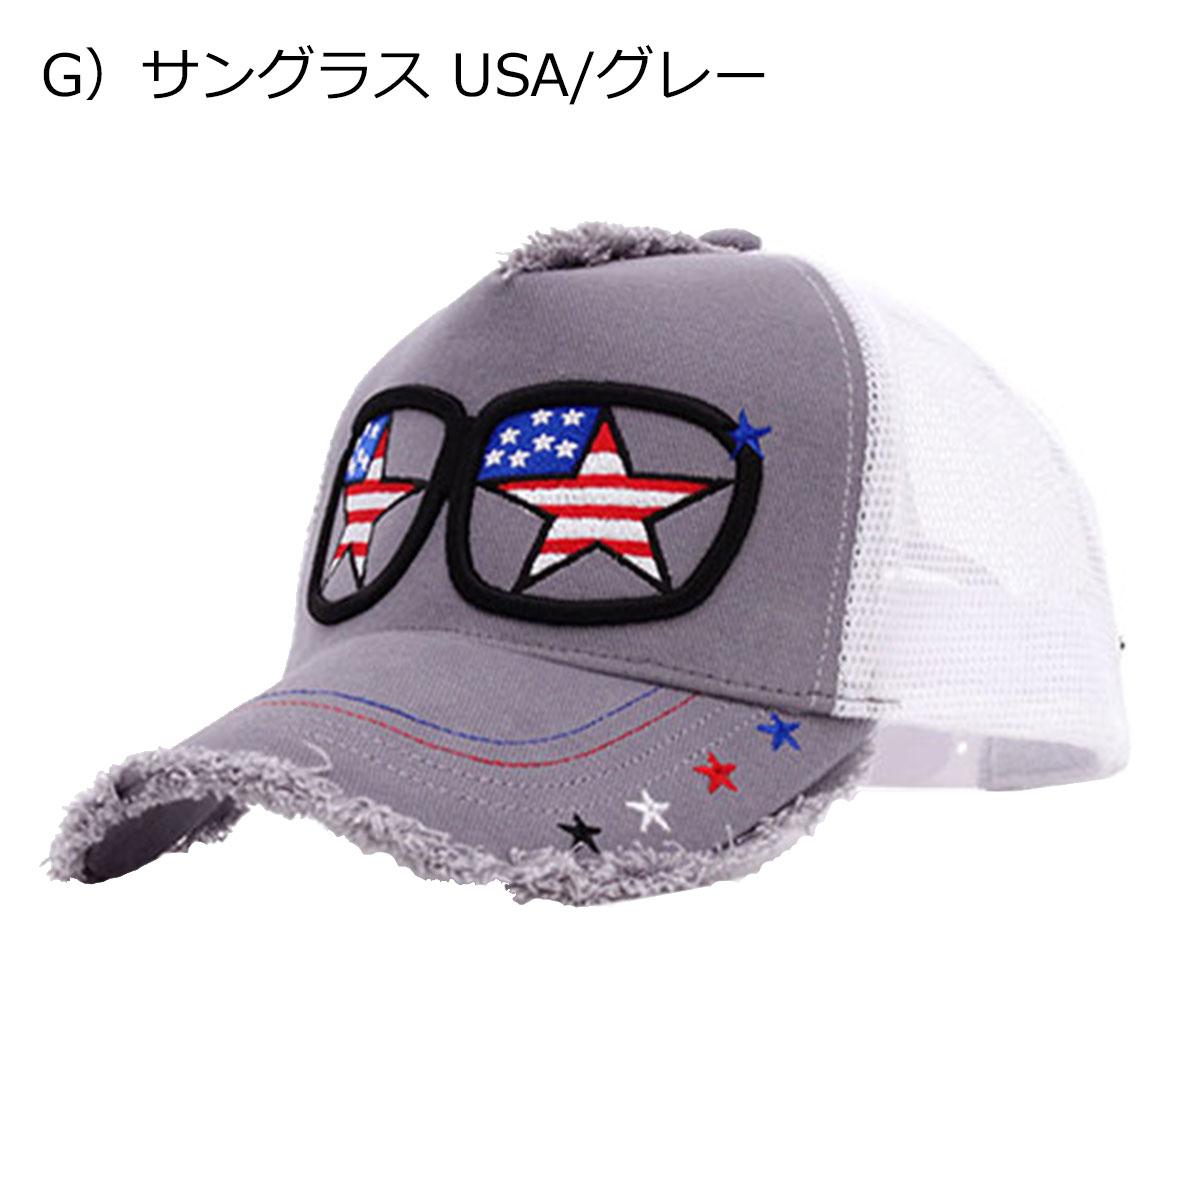 G)サングラス USA/グレー